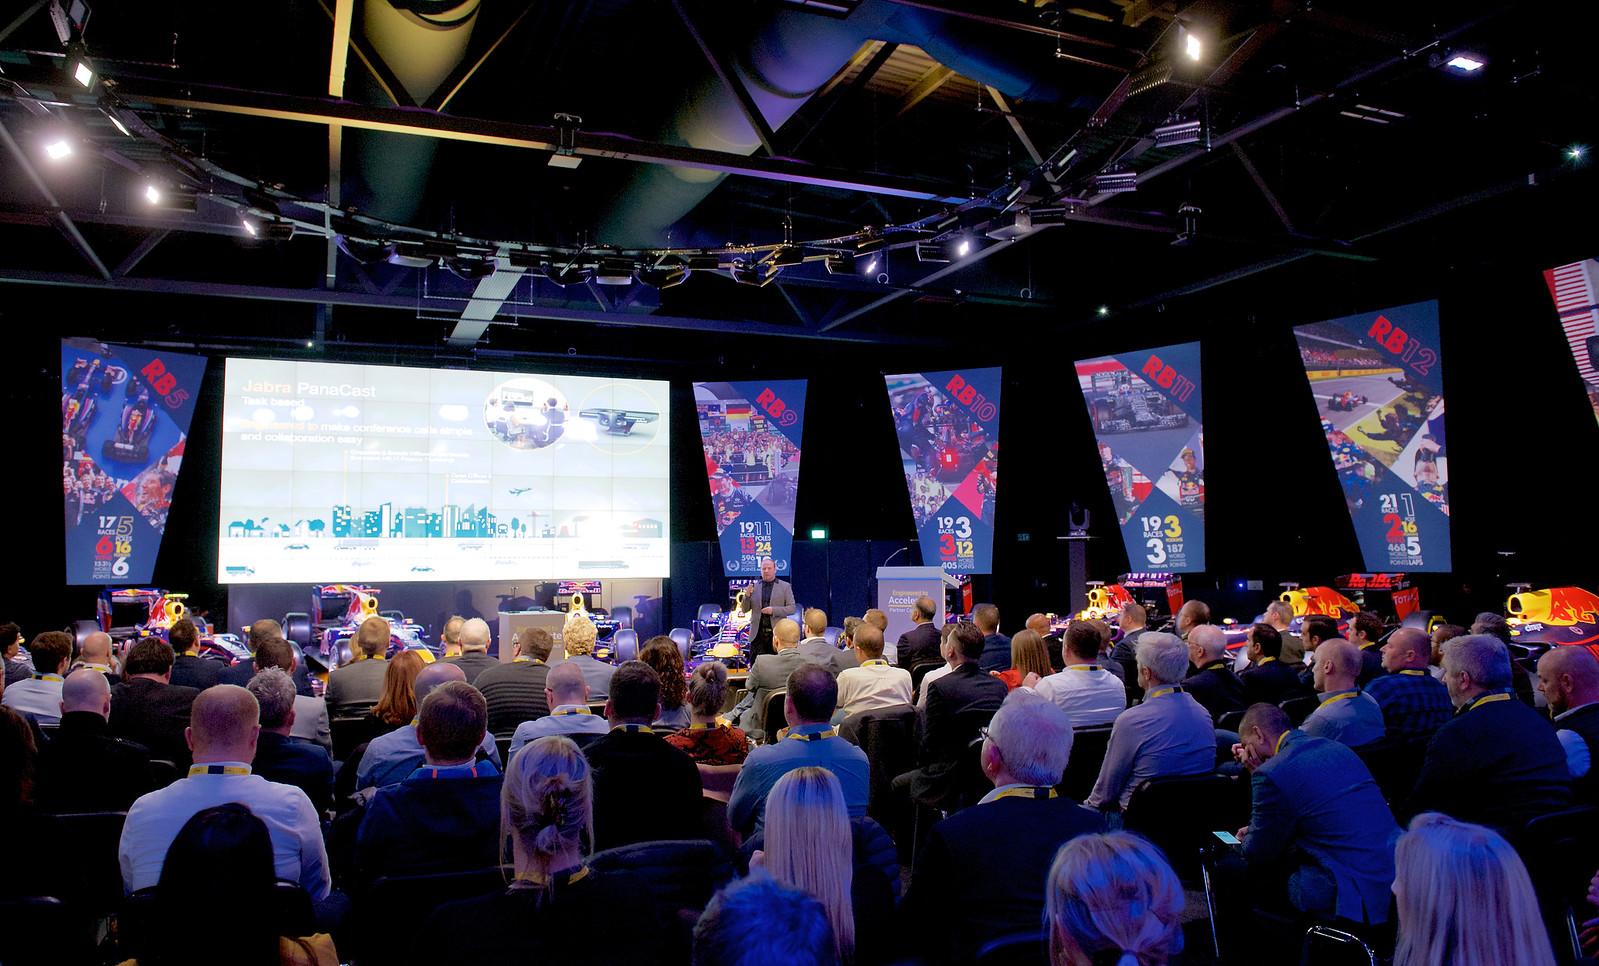 i hx5q8fG X3 - UK&I Channel Partner Conference & Awards Dinner